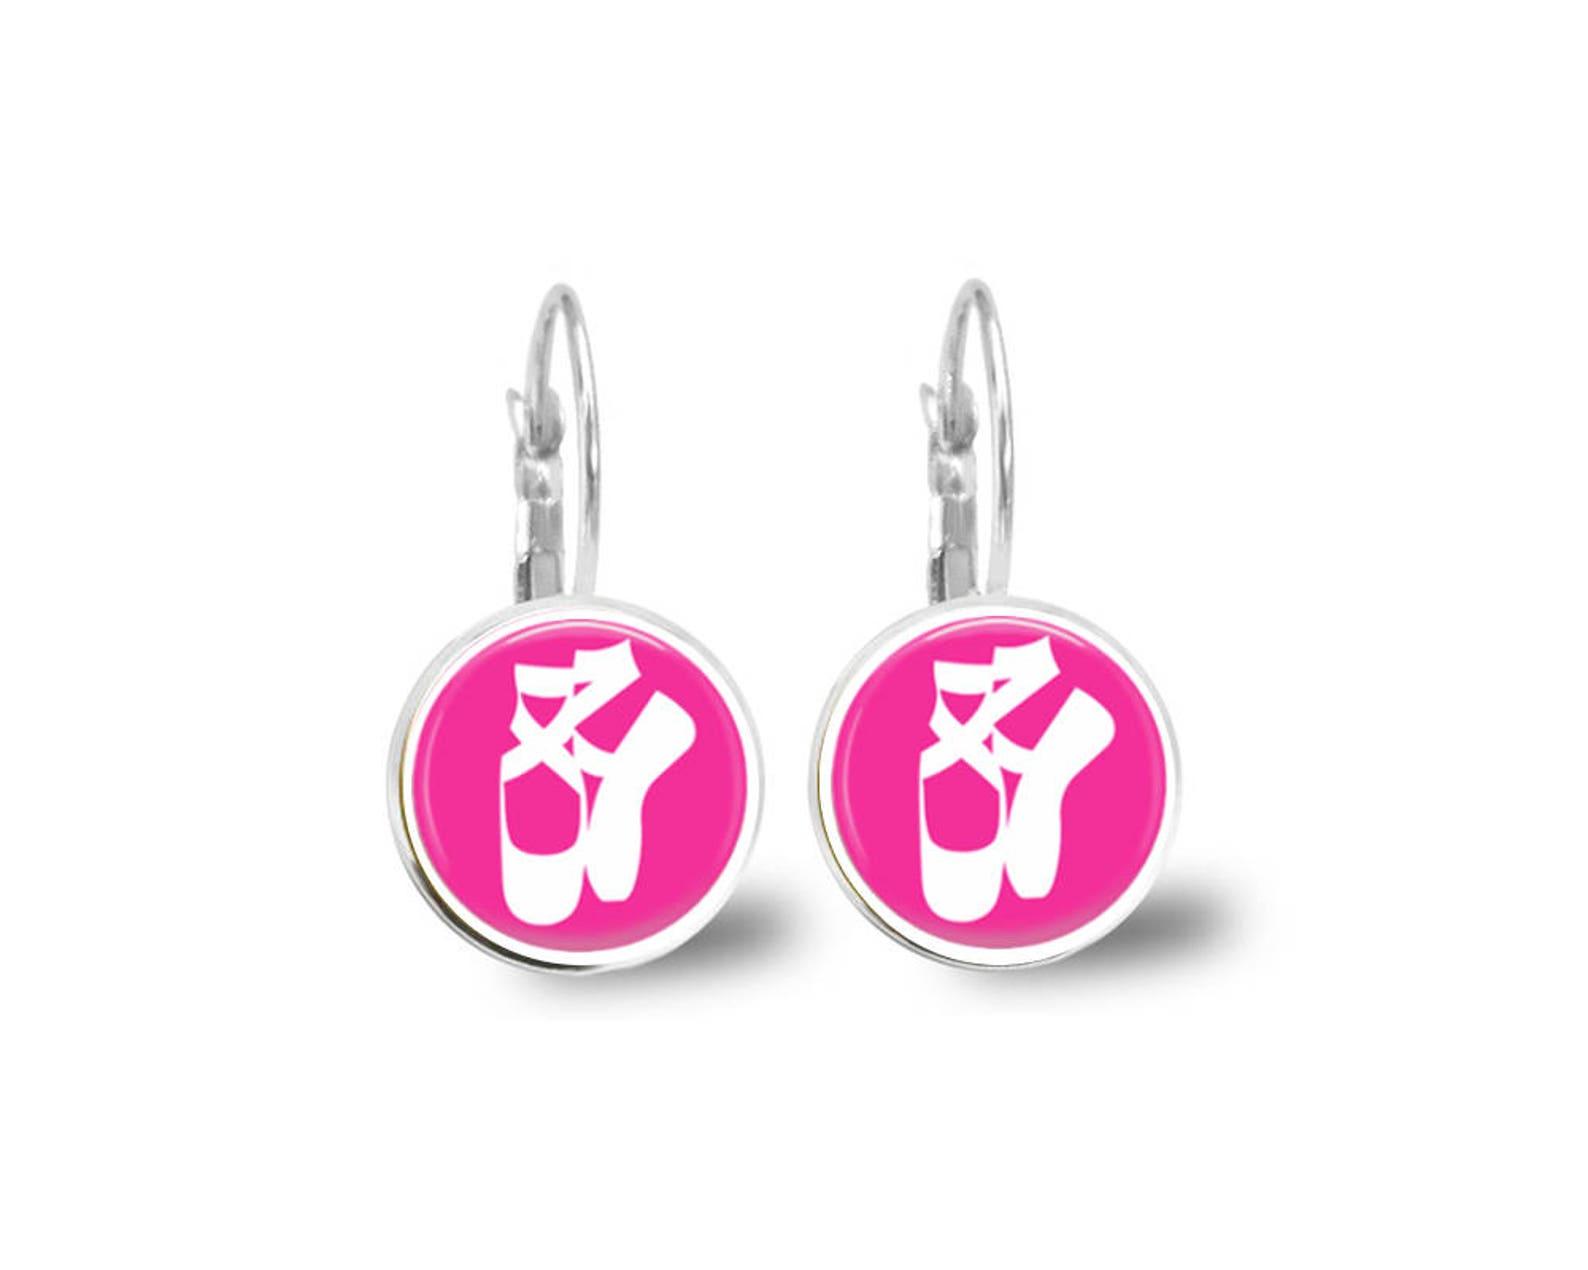 ballet earrings, dance earrings, studs, dangles, dance gift, dance teacher, pink, monogram earrings, name earrings, personalized